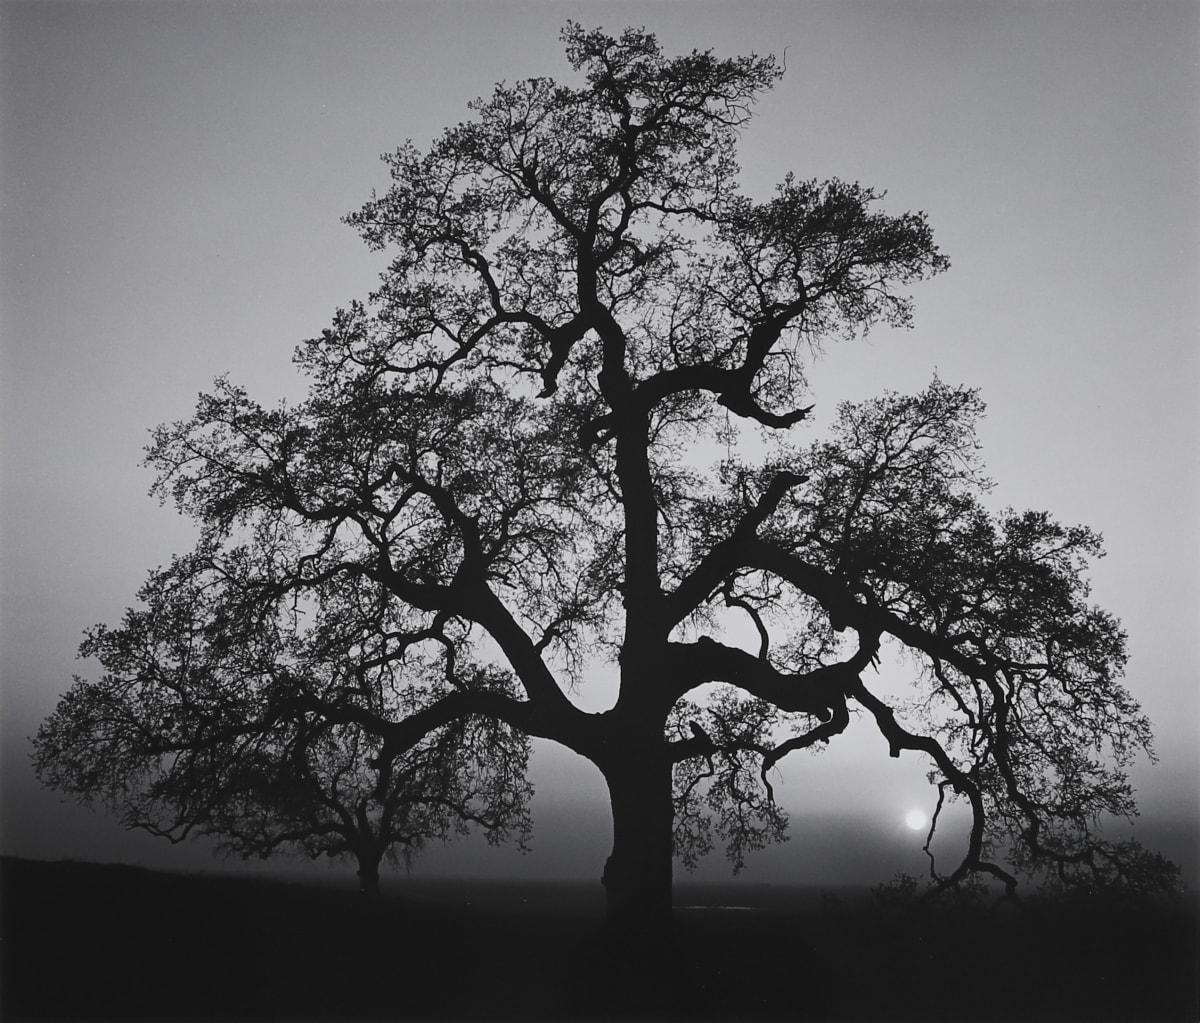 Ansel Adams, Oak Tree, Sunset City, 1962